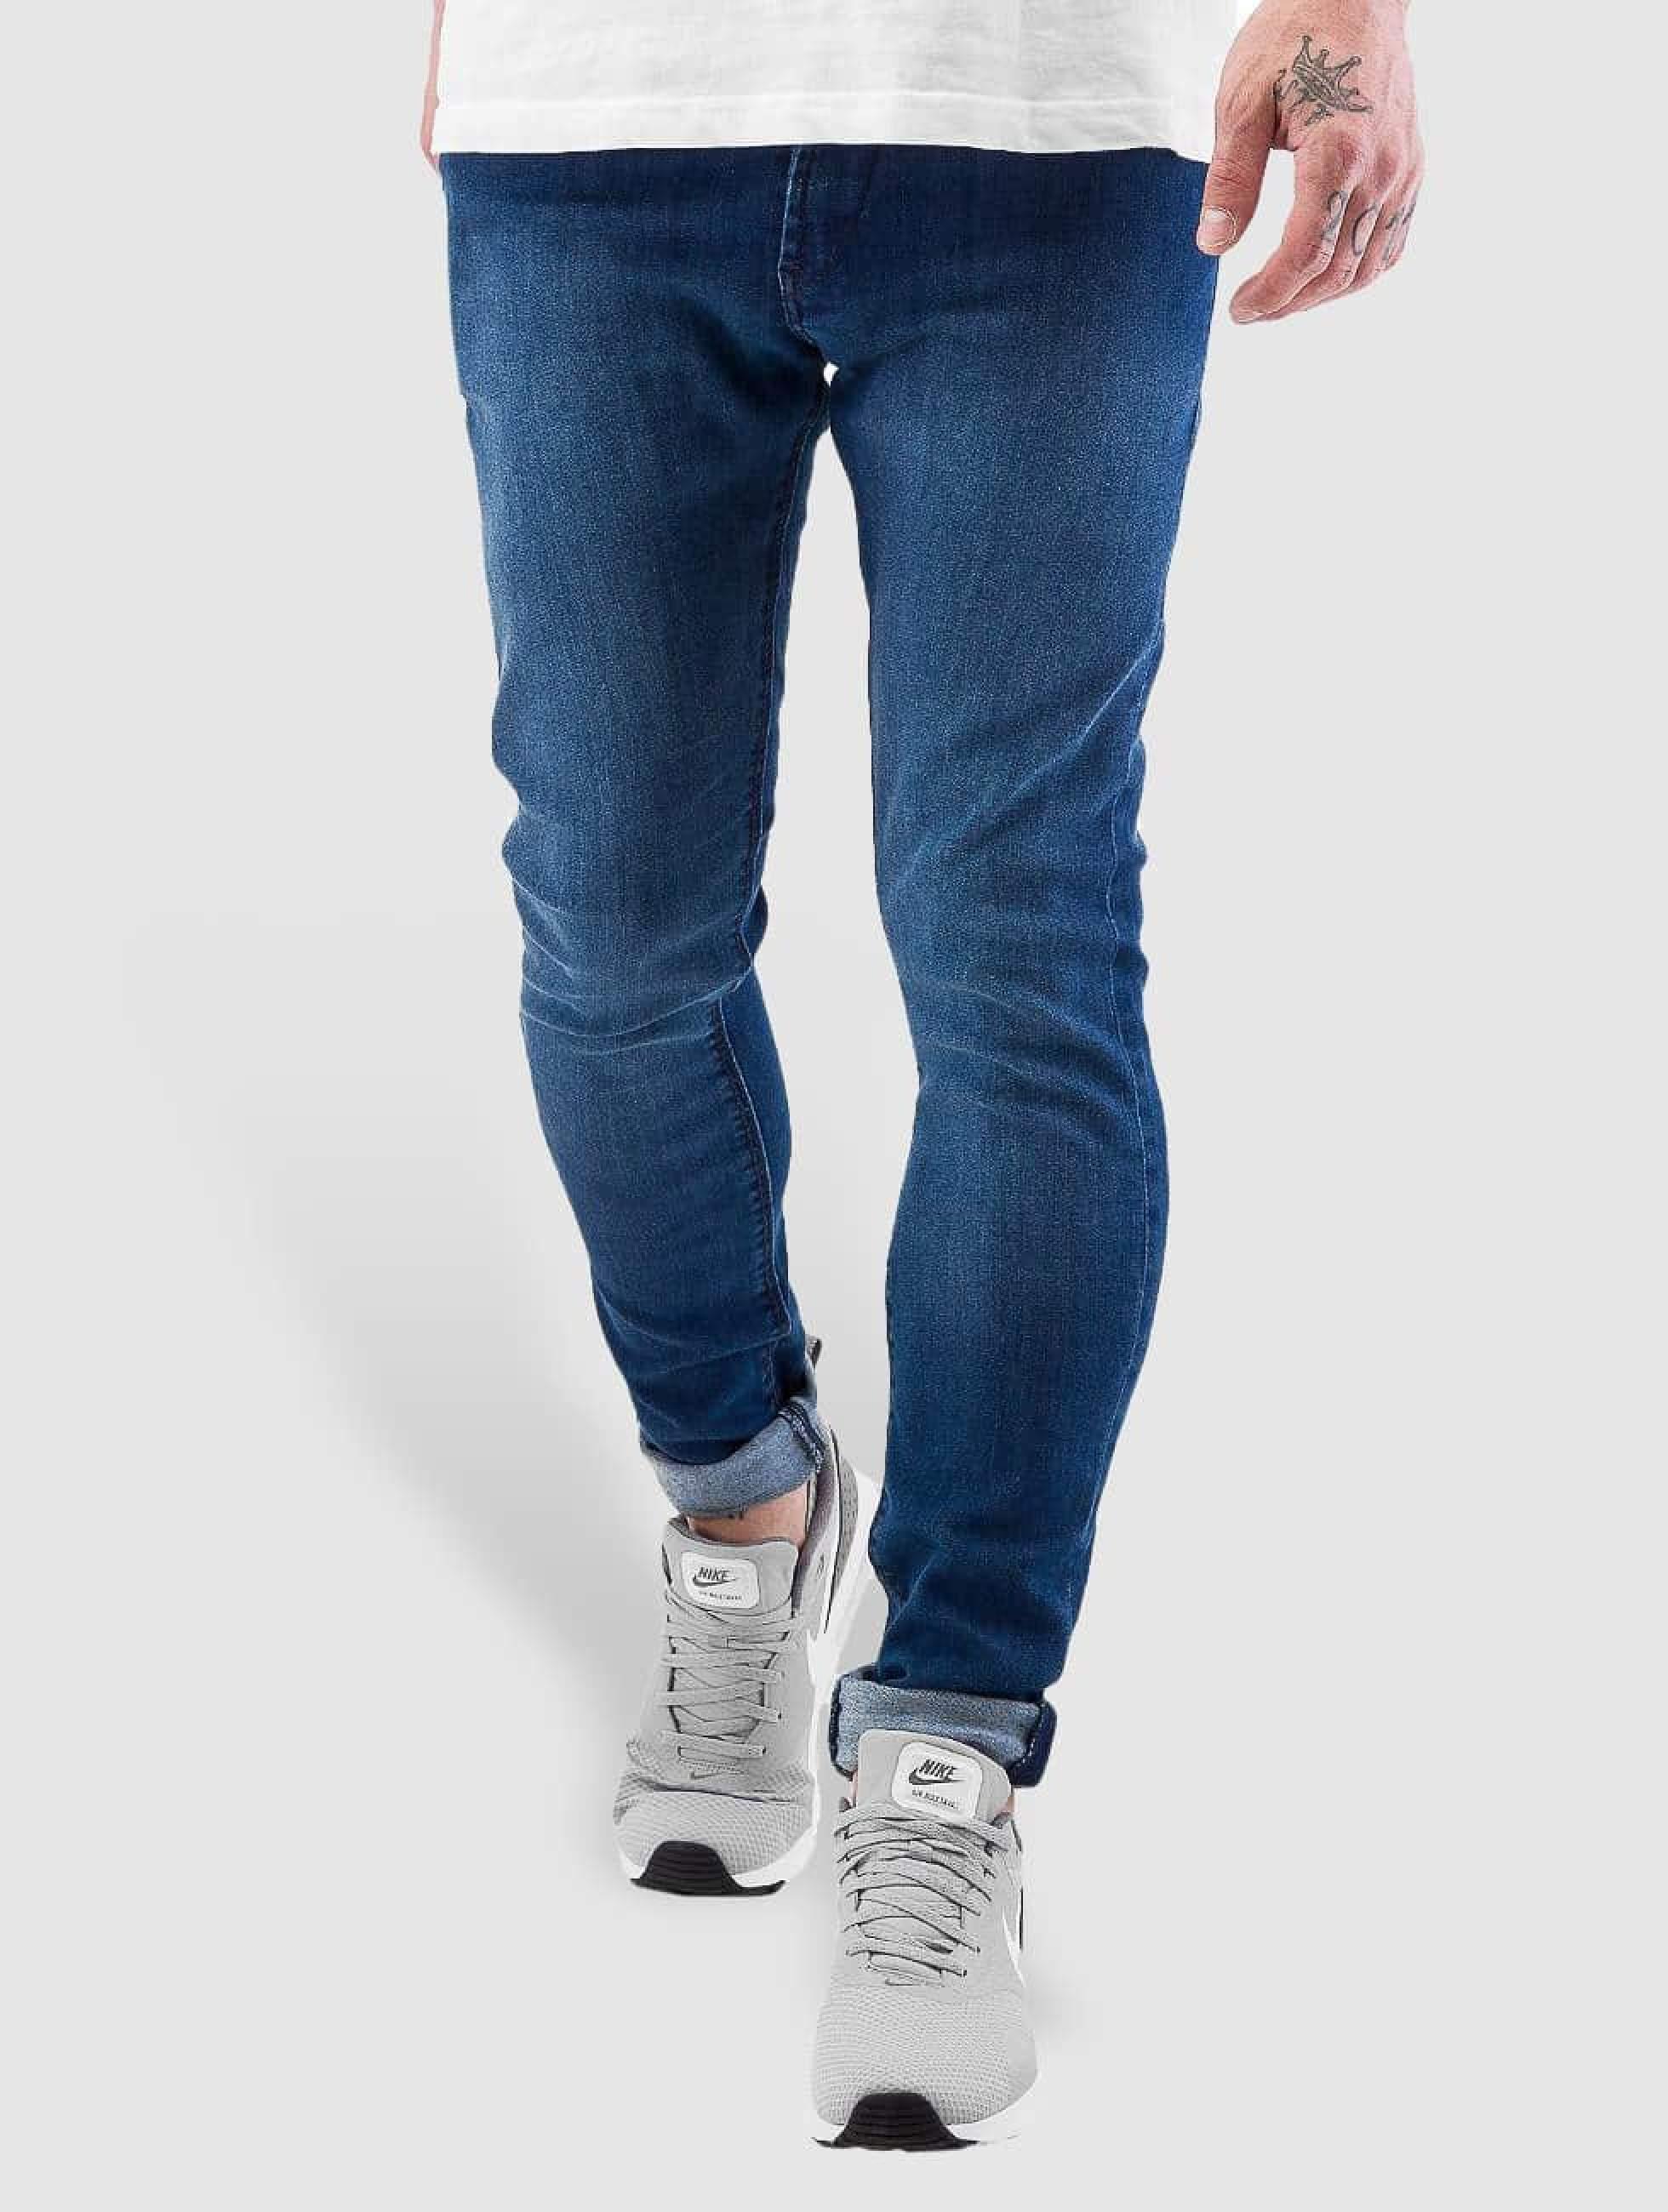 reell jeans herren skinny jeans radar stretch super slim fit in blau 104198. Black Bedroom Furniture Sets. Home Design Ideas